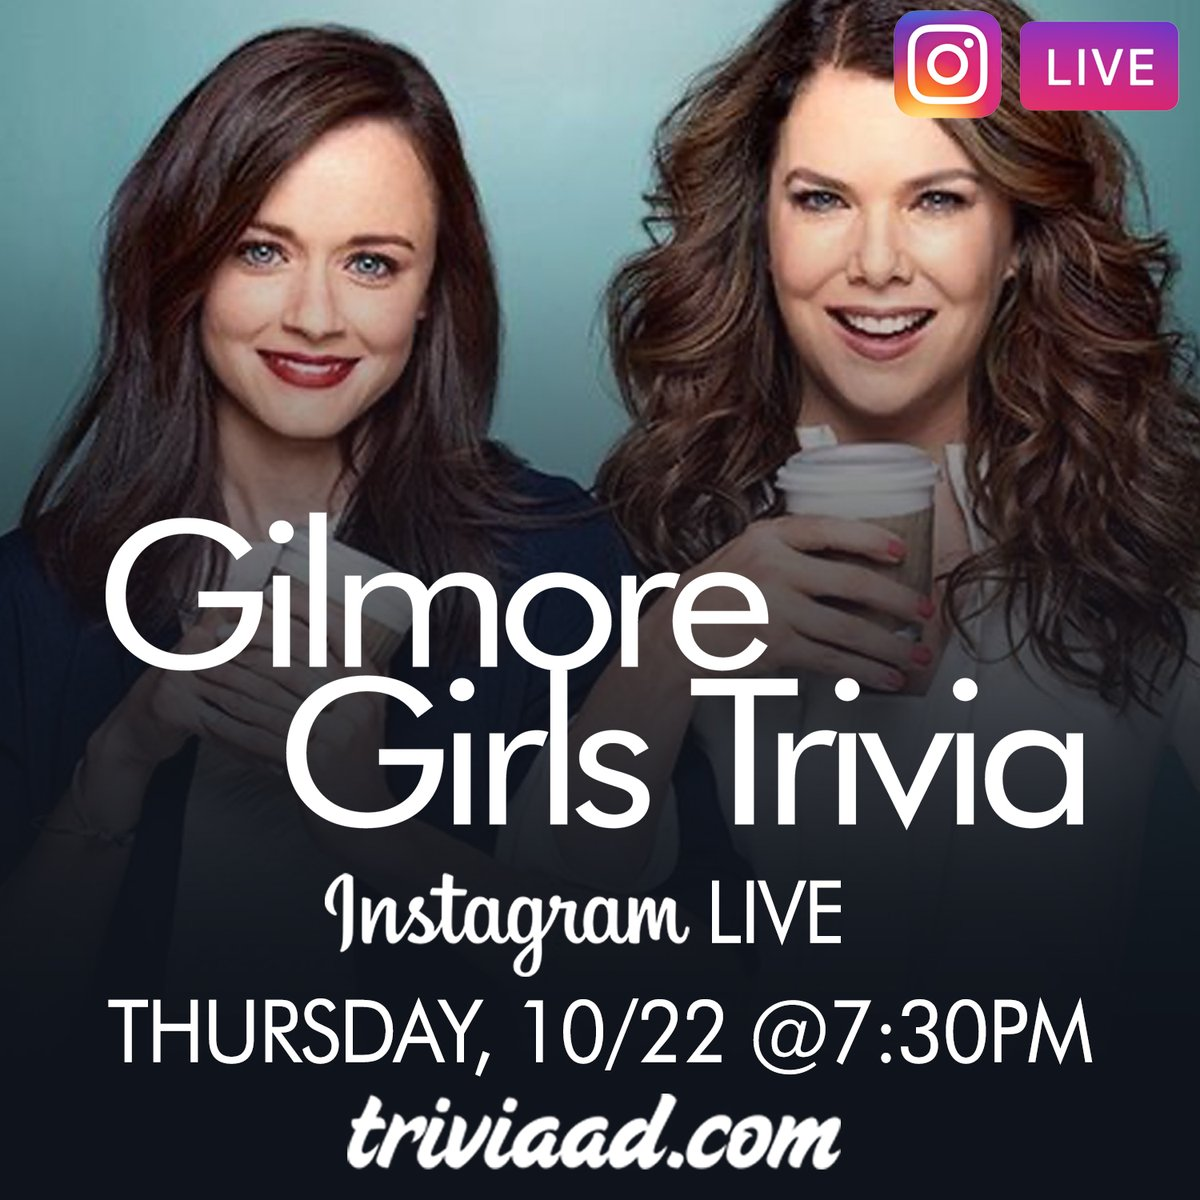 #GilmoreGirls #Trivia on #InstagramLIVE on Thursday, October 22 at 7:30pm ET. Follow @TriviaADDotCom on #Instagram to play! #GilmoreGirlsTrivia #ThemedTrivia #ThrowbackThursday #TBT https://t.co/GEEmQ1Ipb0